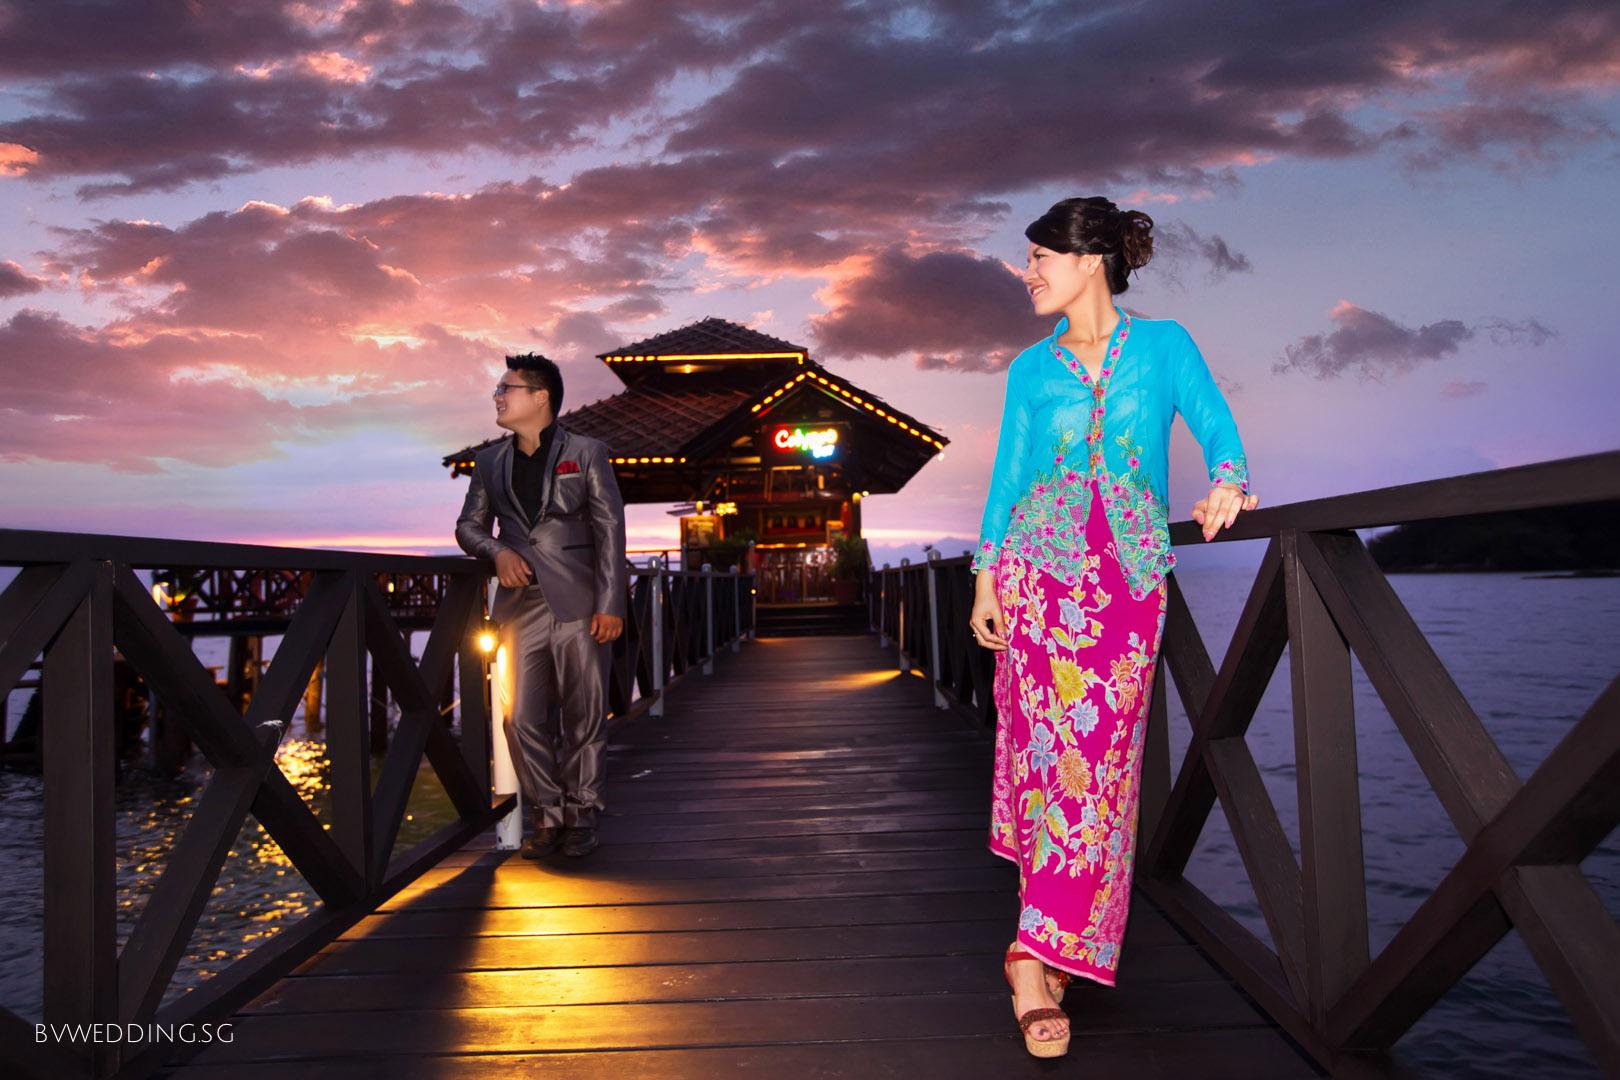 Pre-wedding photoshoot at Bintan Island Peranakan style